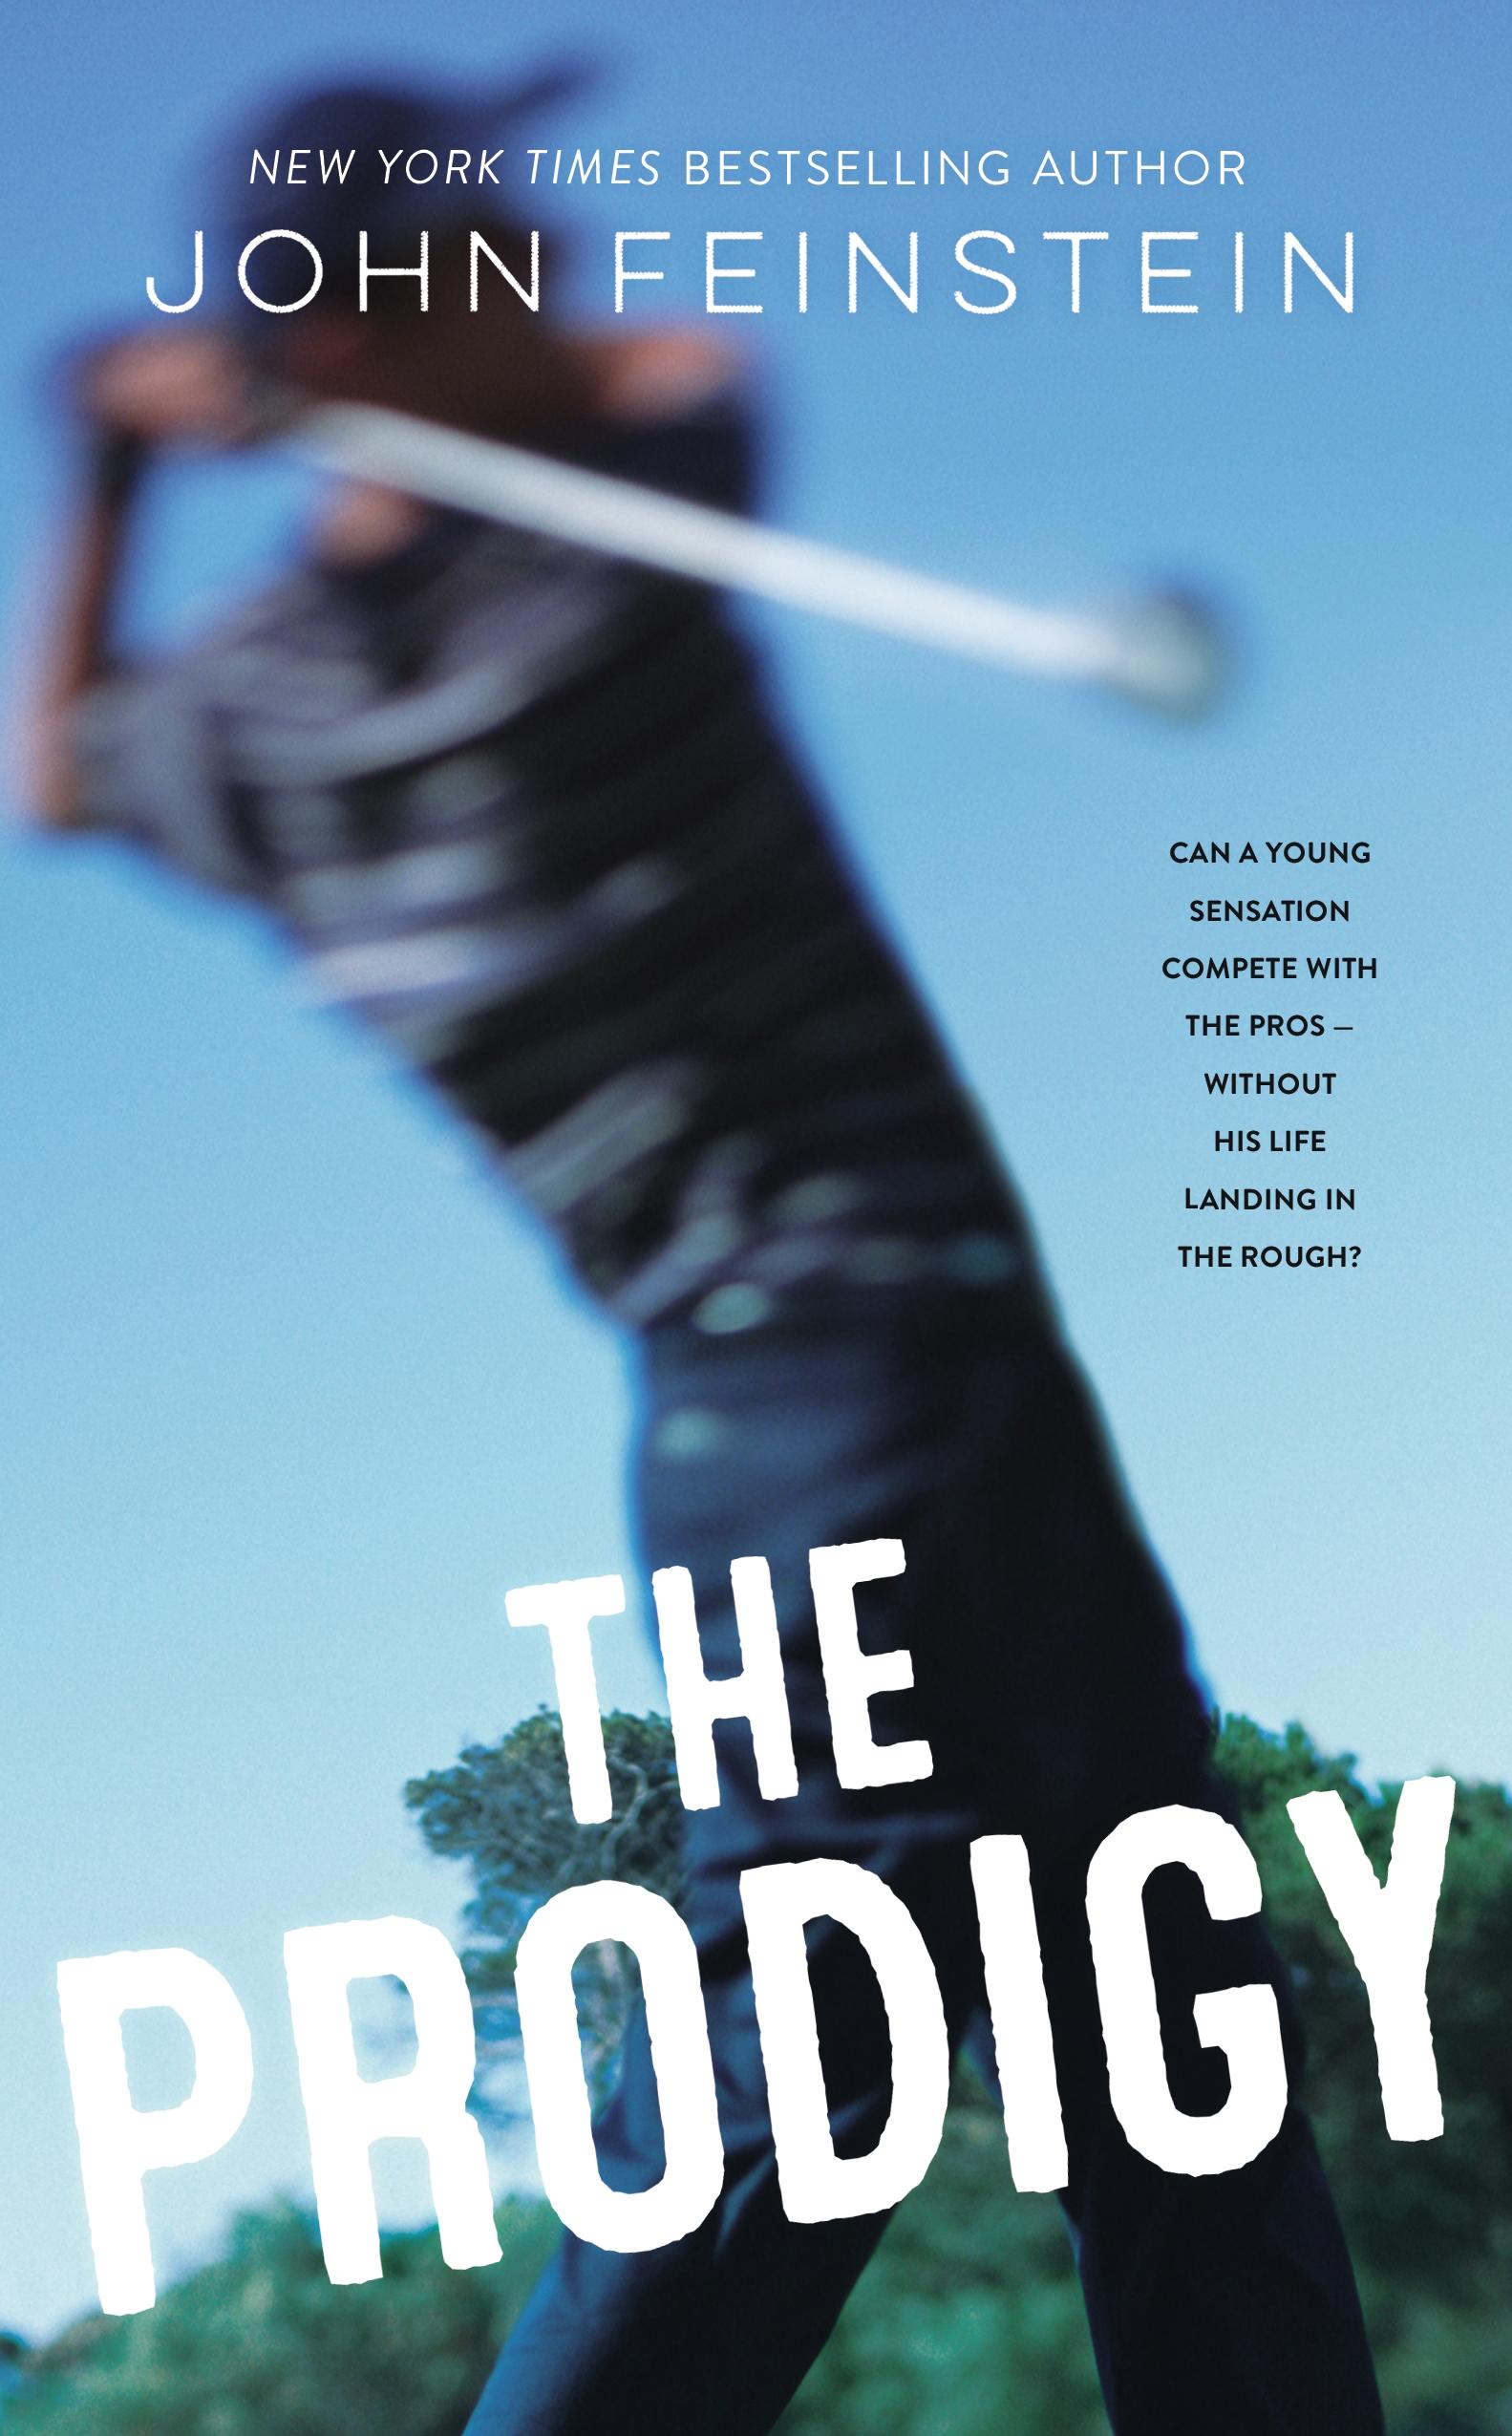 The Prodigy , John Feinstein  For Farrar, Straus and Giroux BYR.